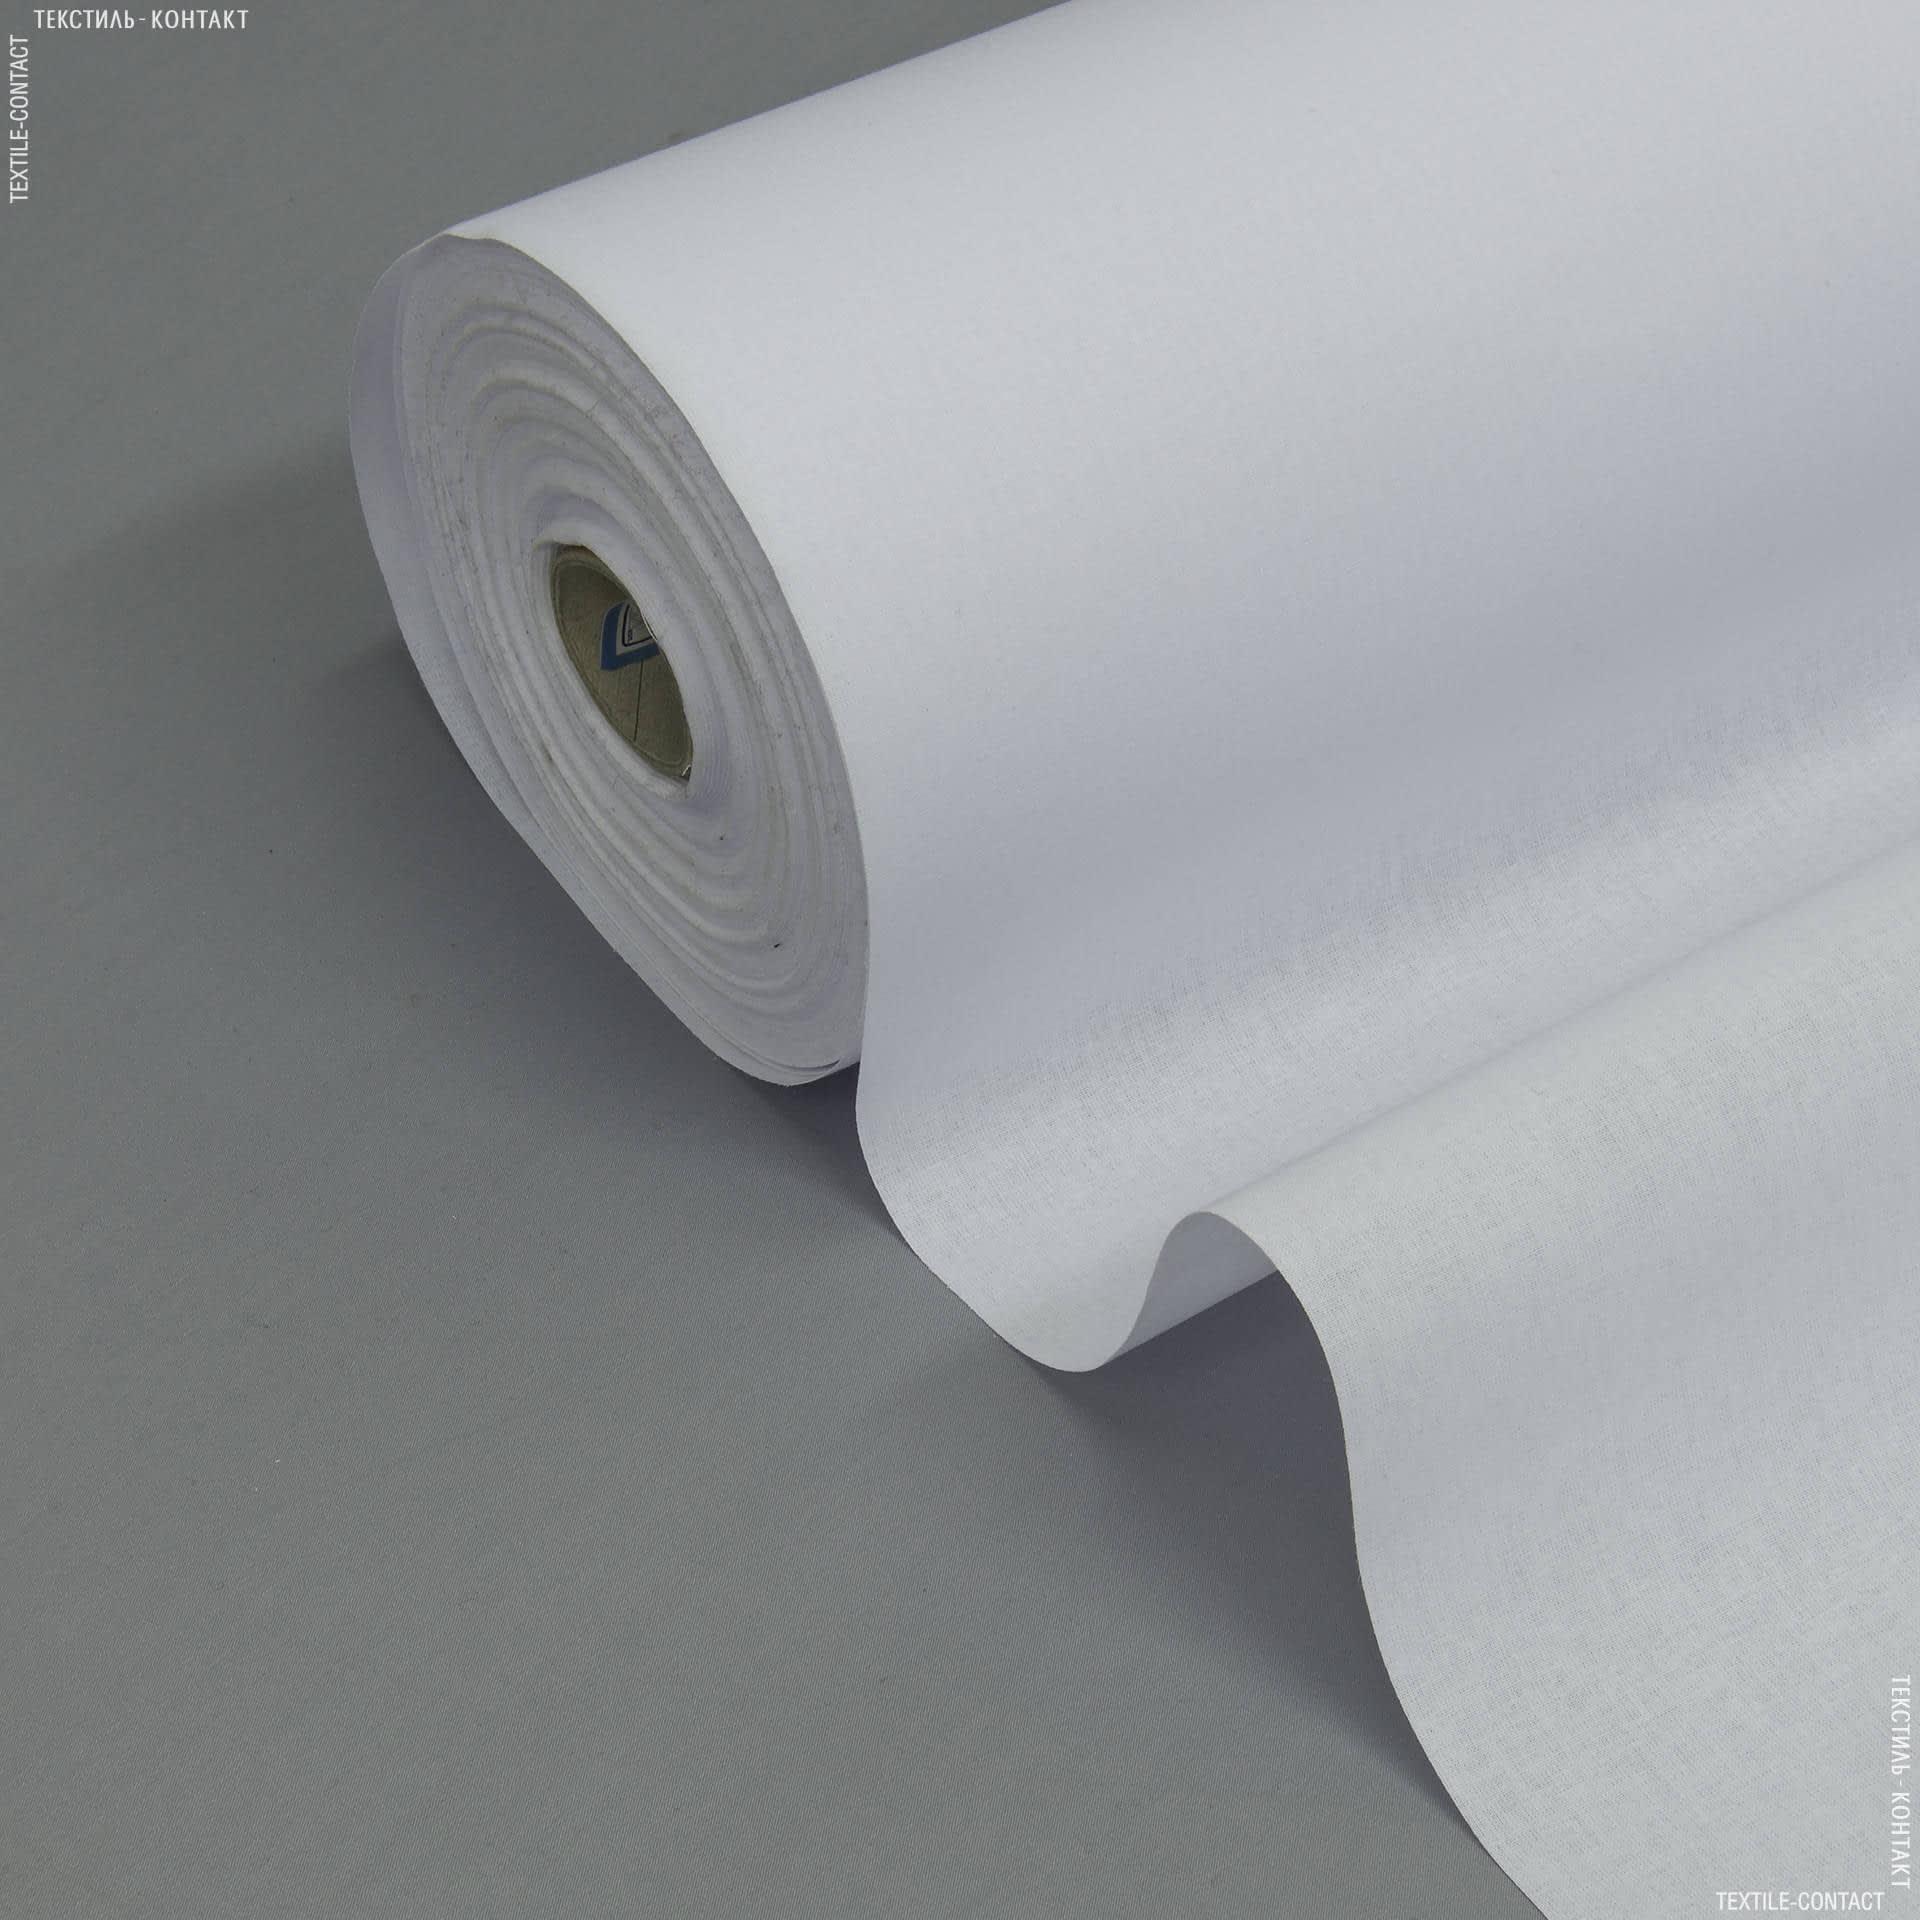 Ткани дублирин, флизелин - Бязь клеевая белый 172г/м